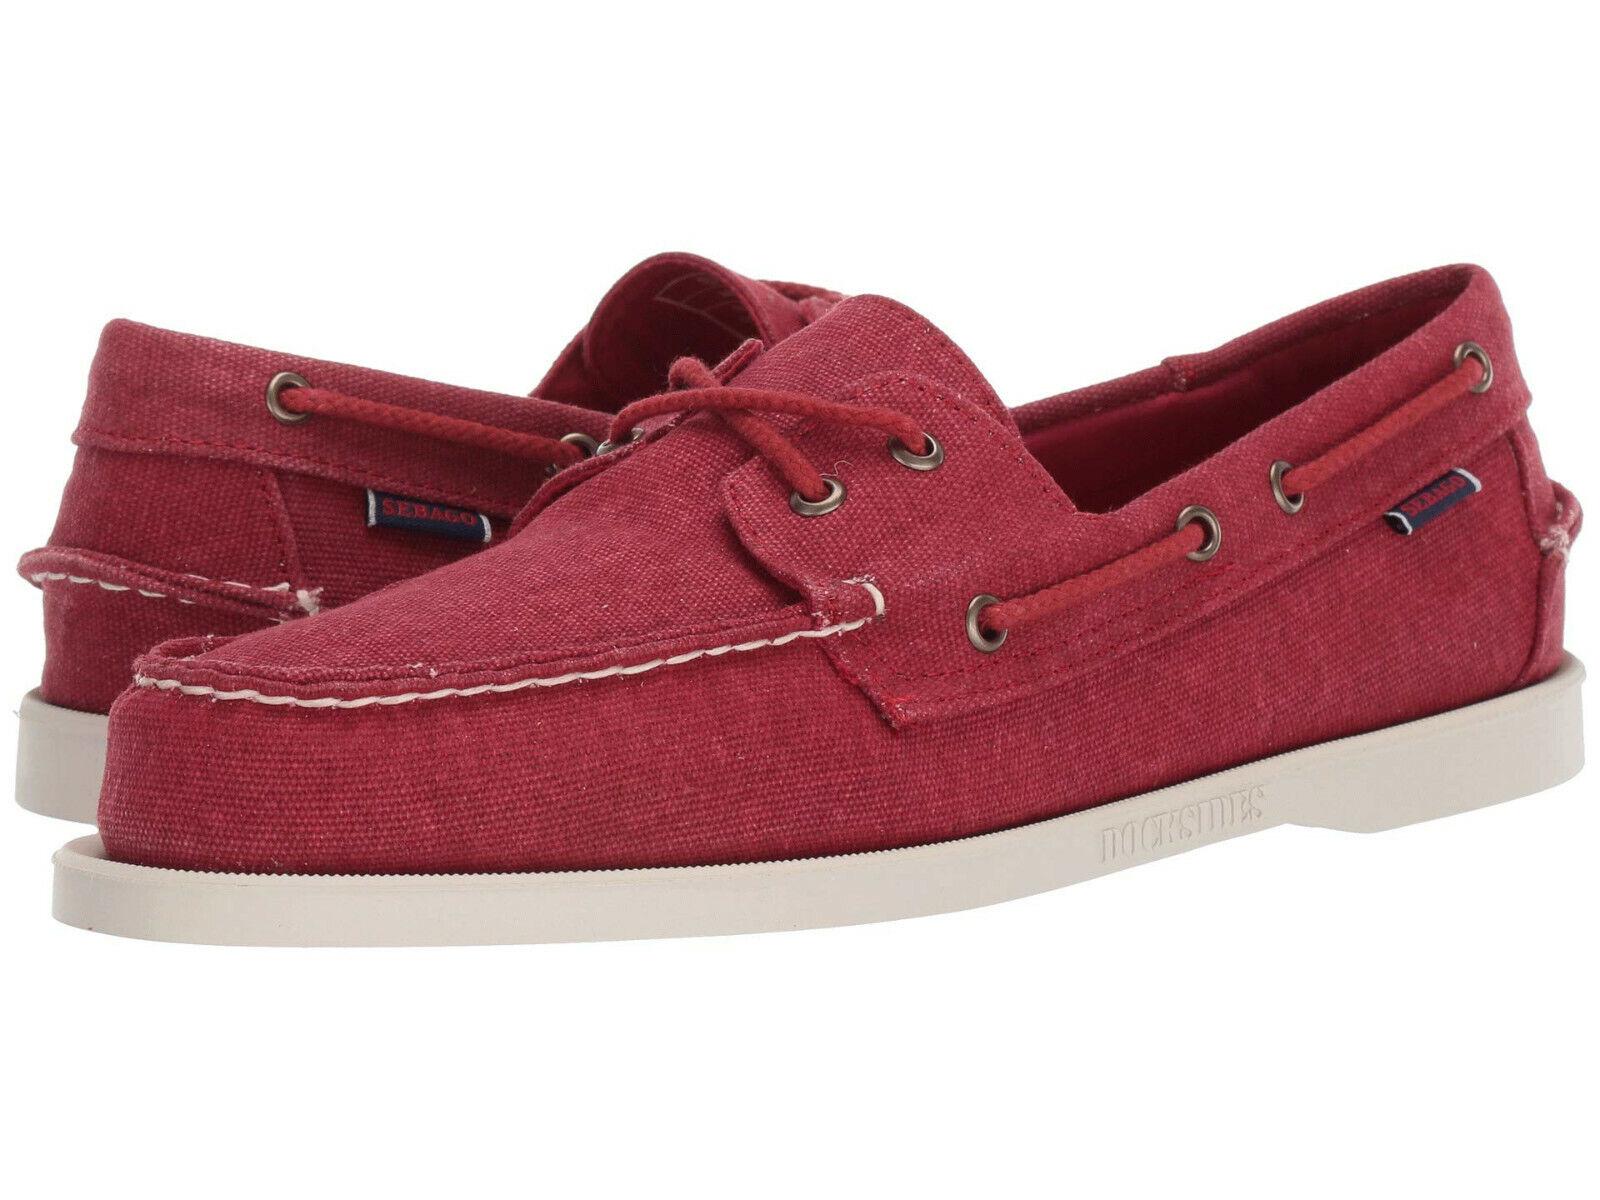 Sebago Women's Spinnaker Boat Shoes Red